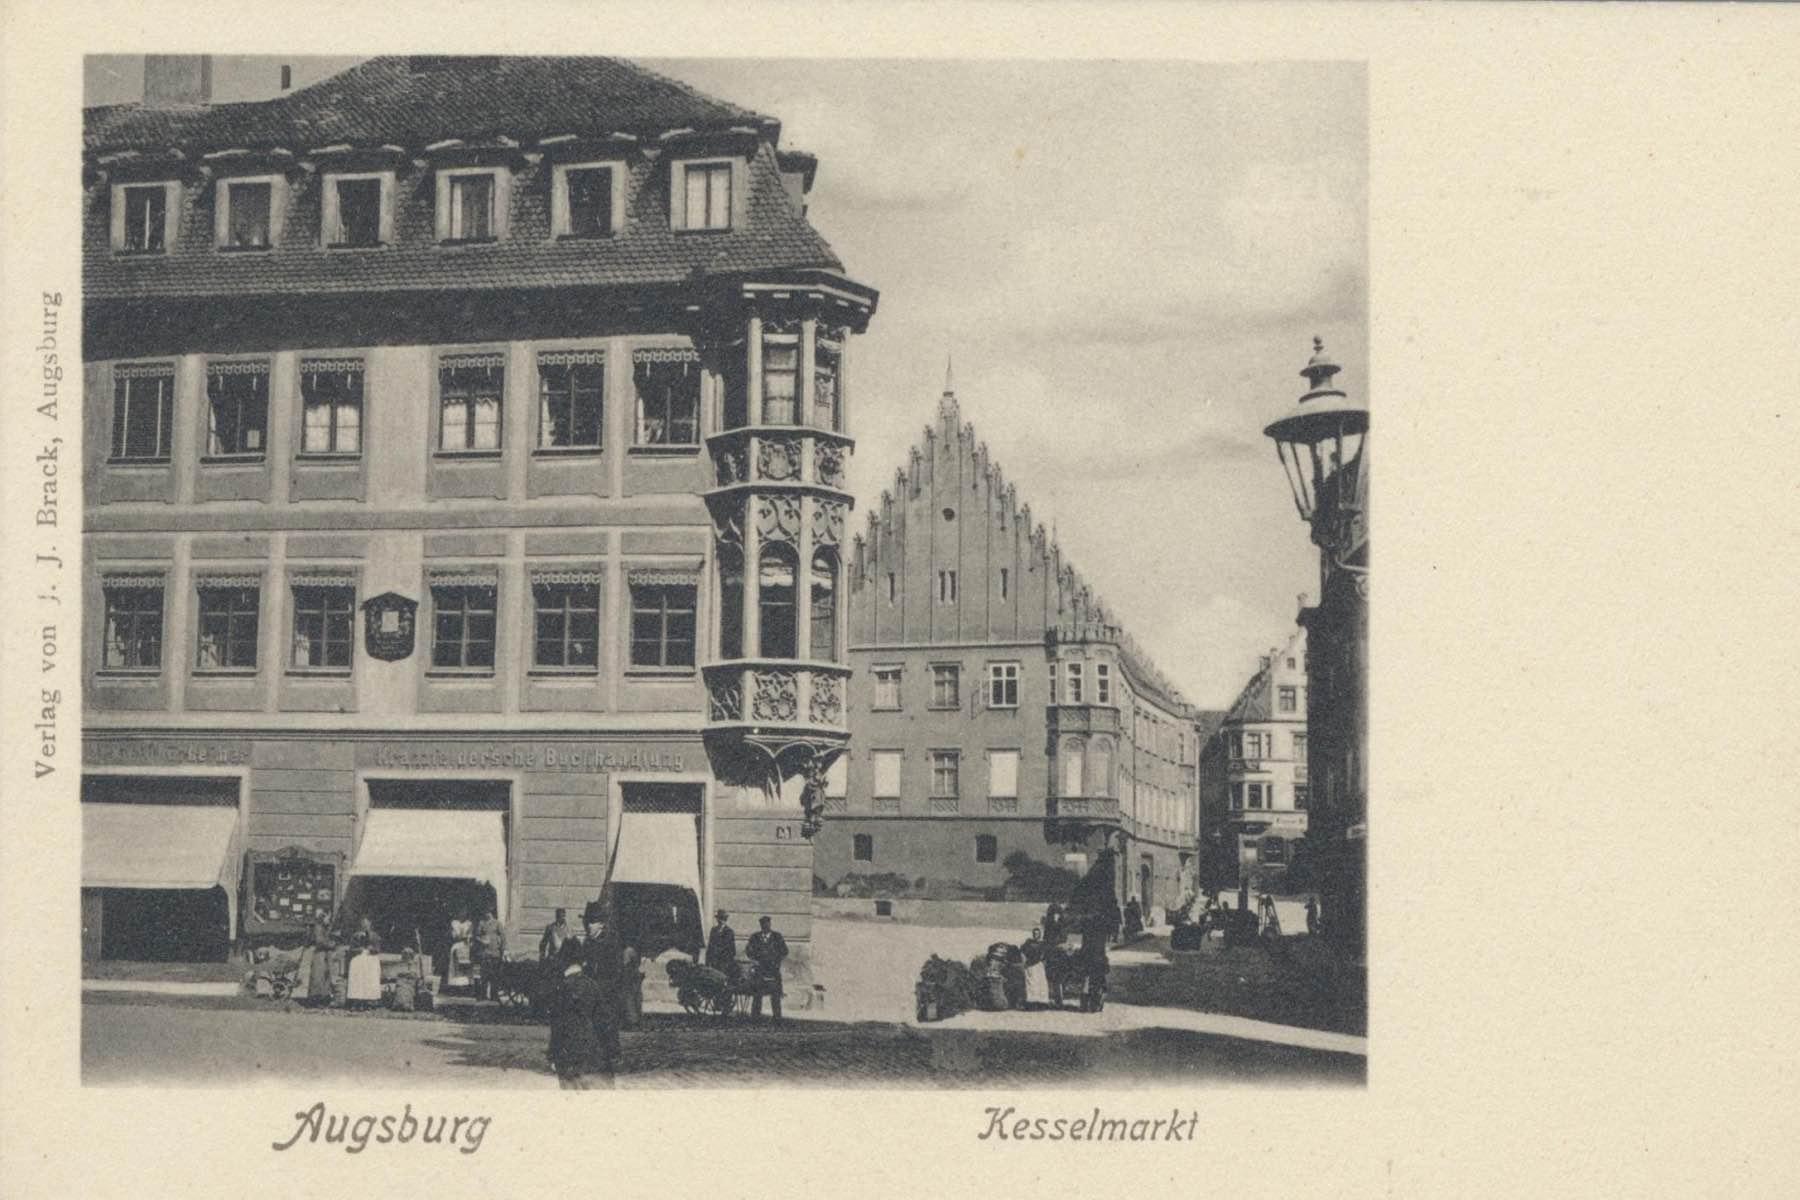 geheimtipp Augsburg Kesselmarkt – ©Privatsammlung: Gregor Nagler